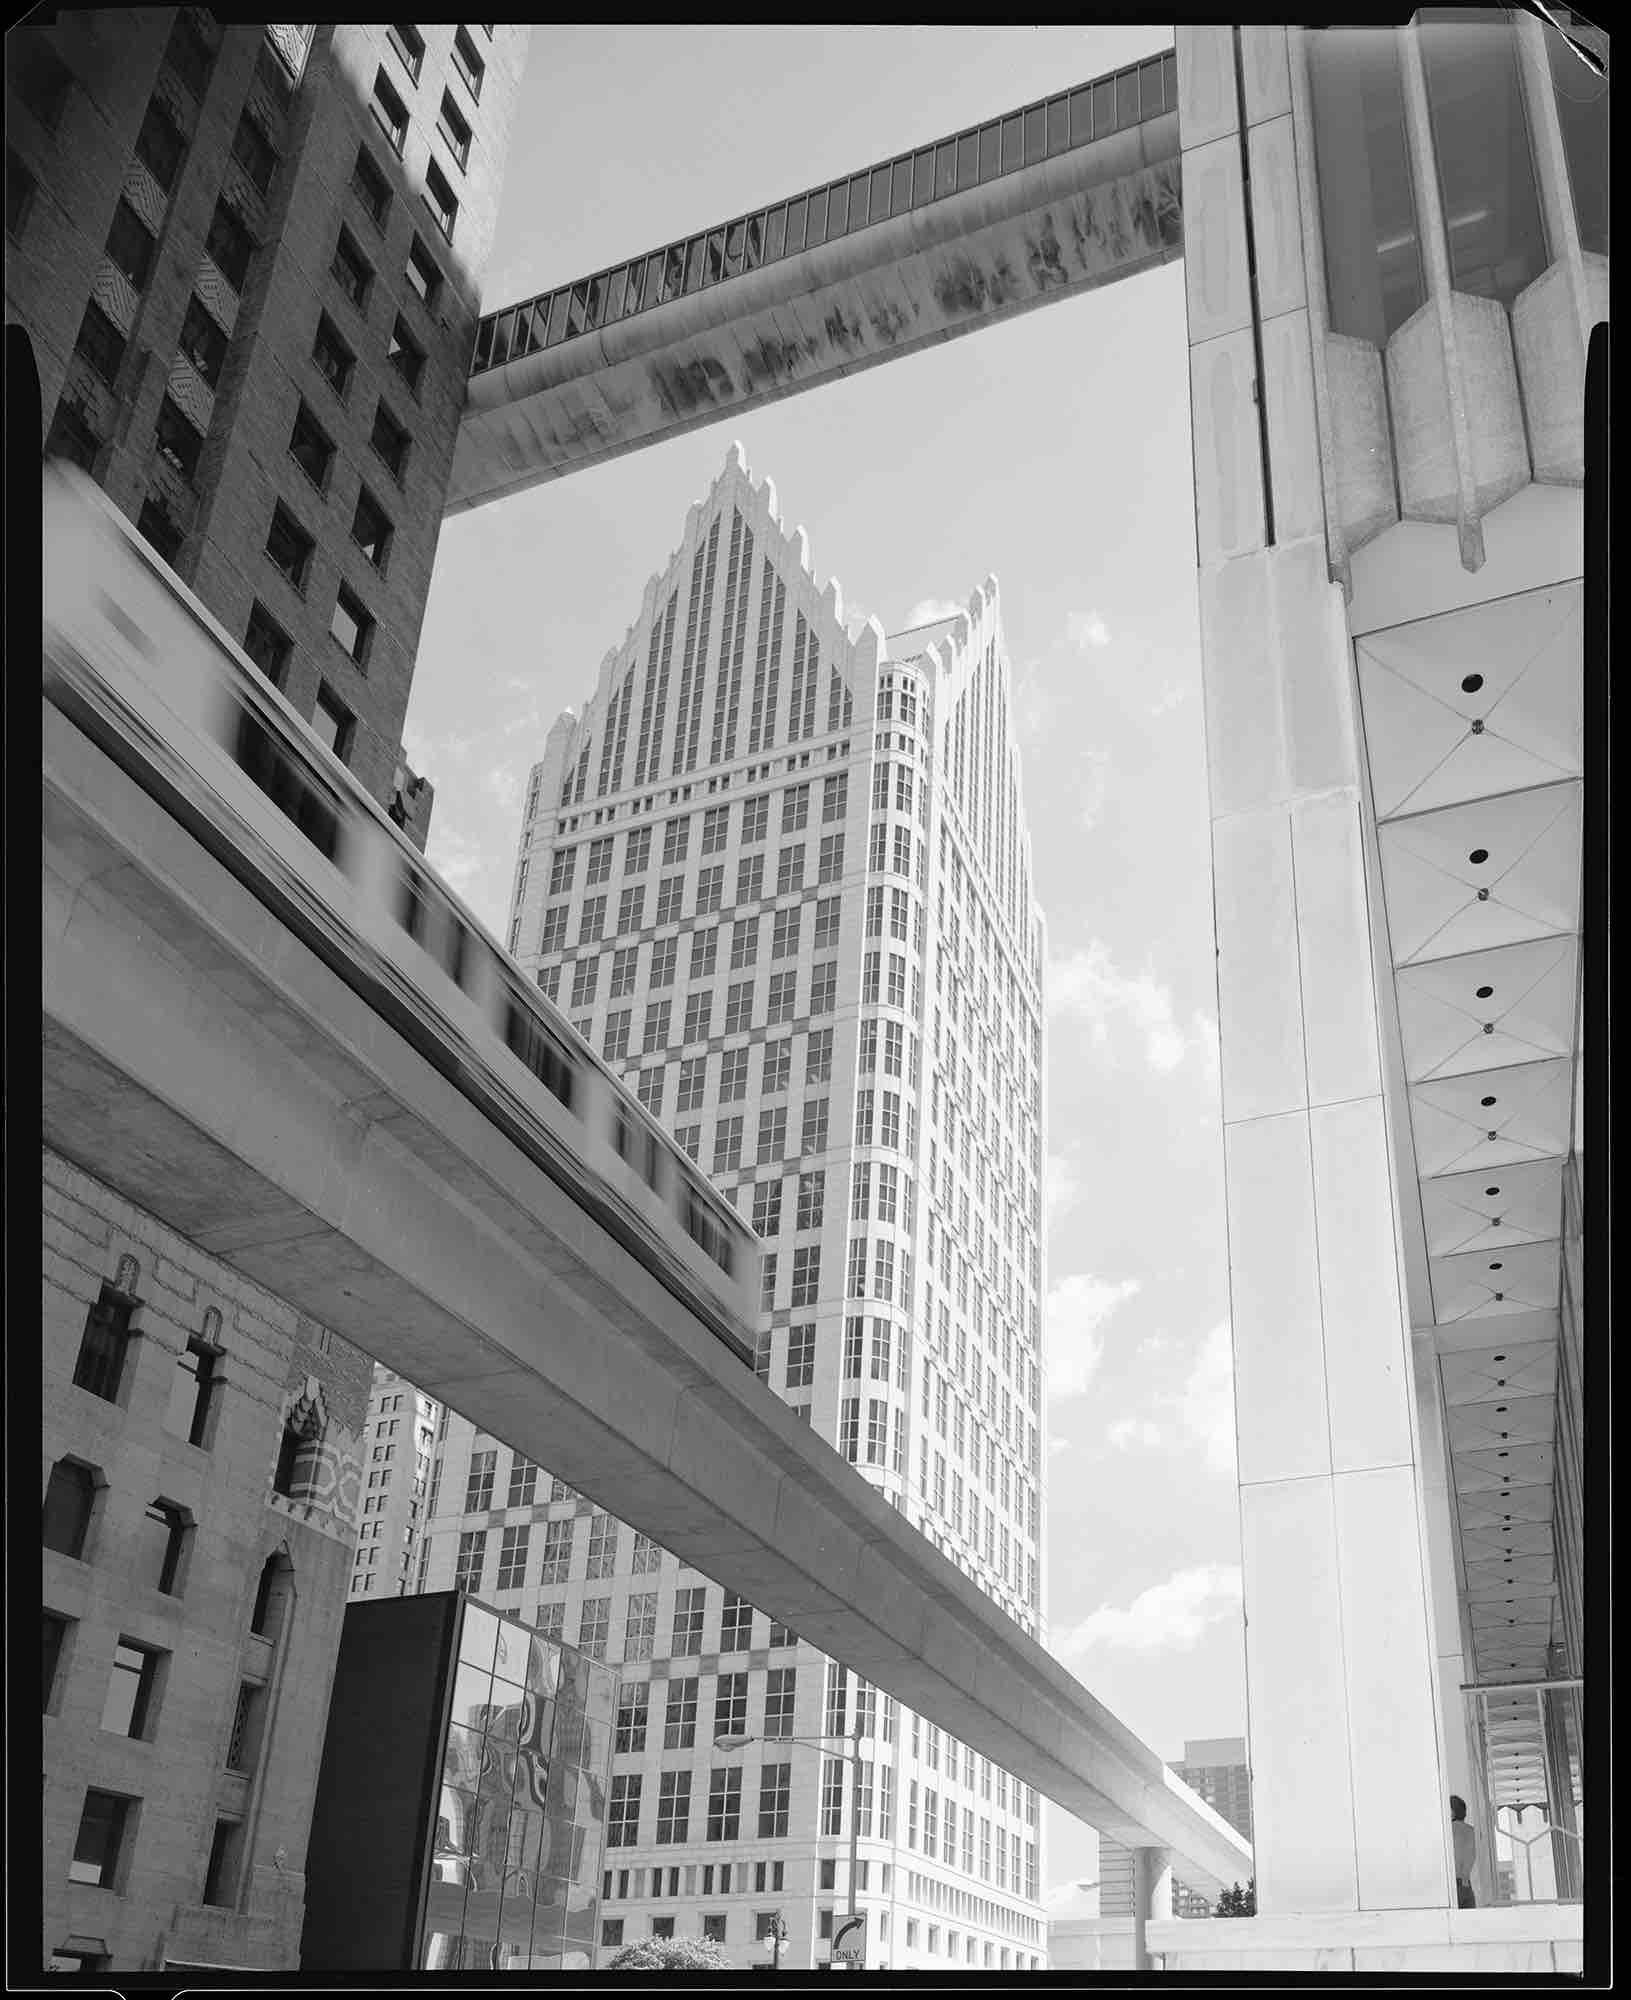 Philip Johnson, One Detroit Center (Detroit, MI) 1993